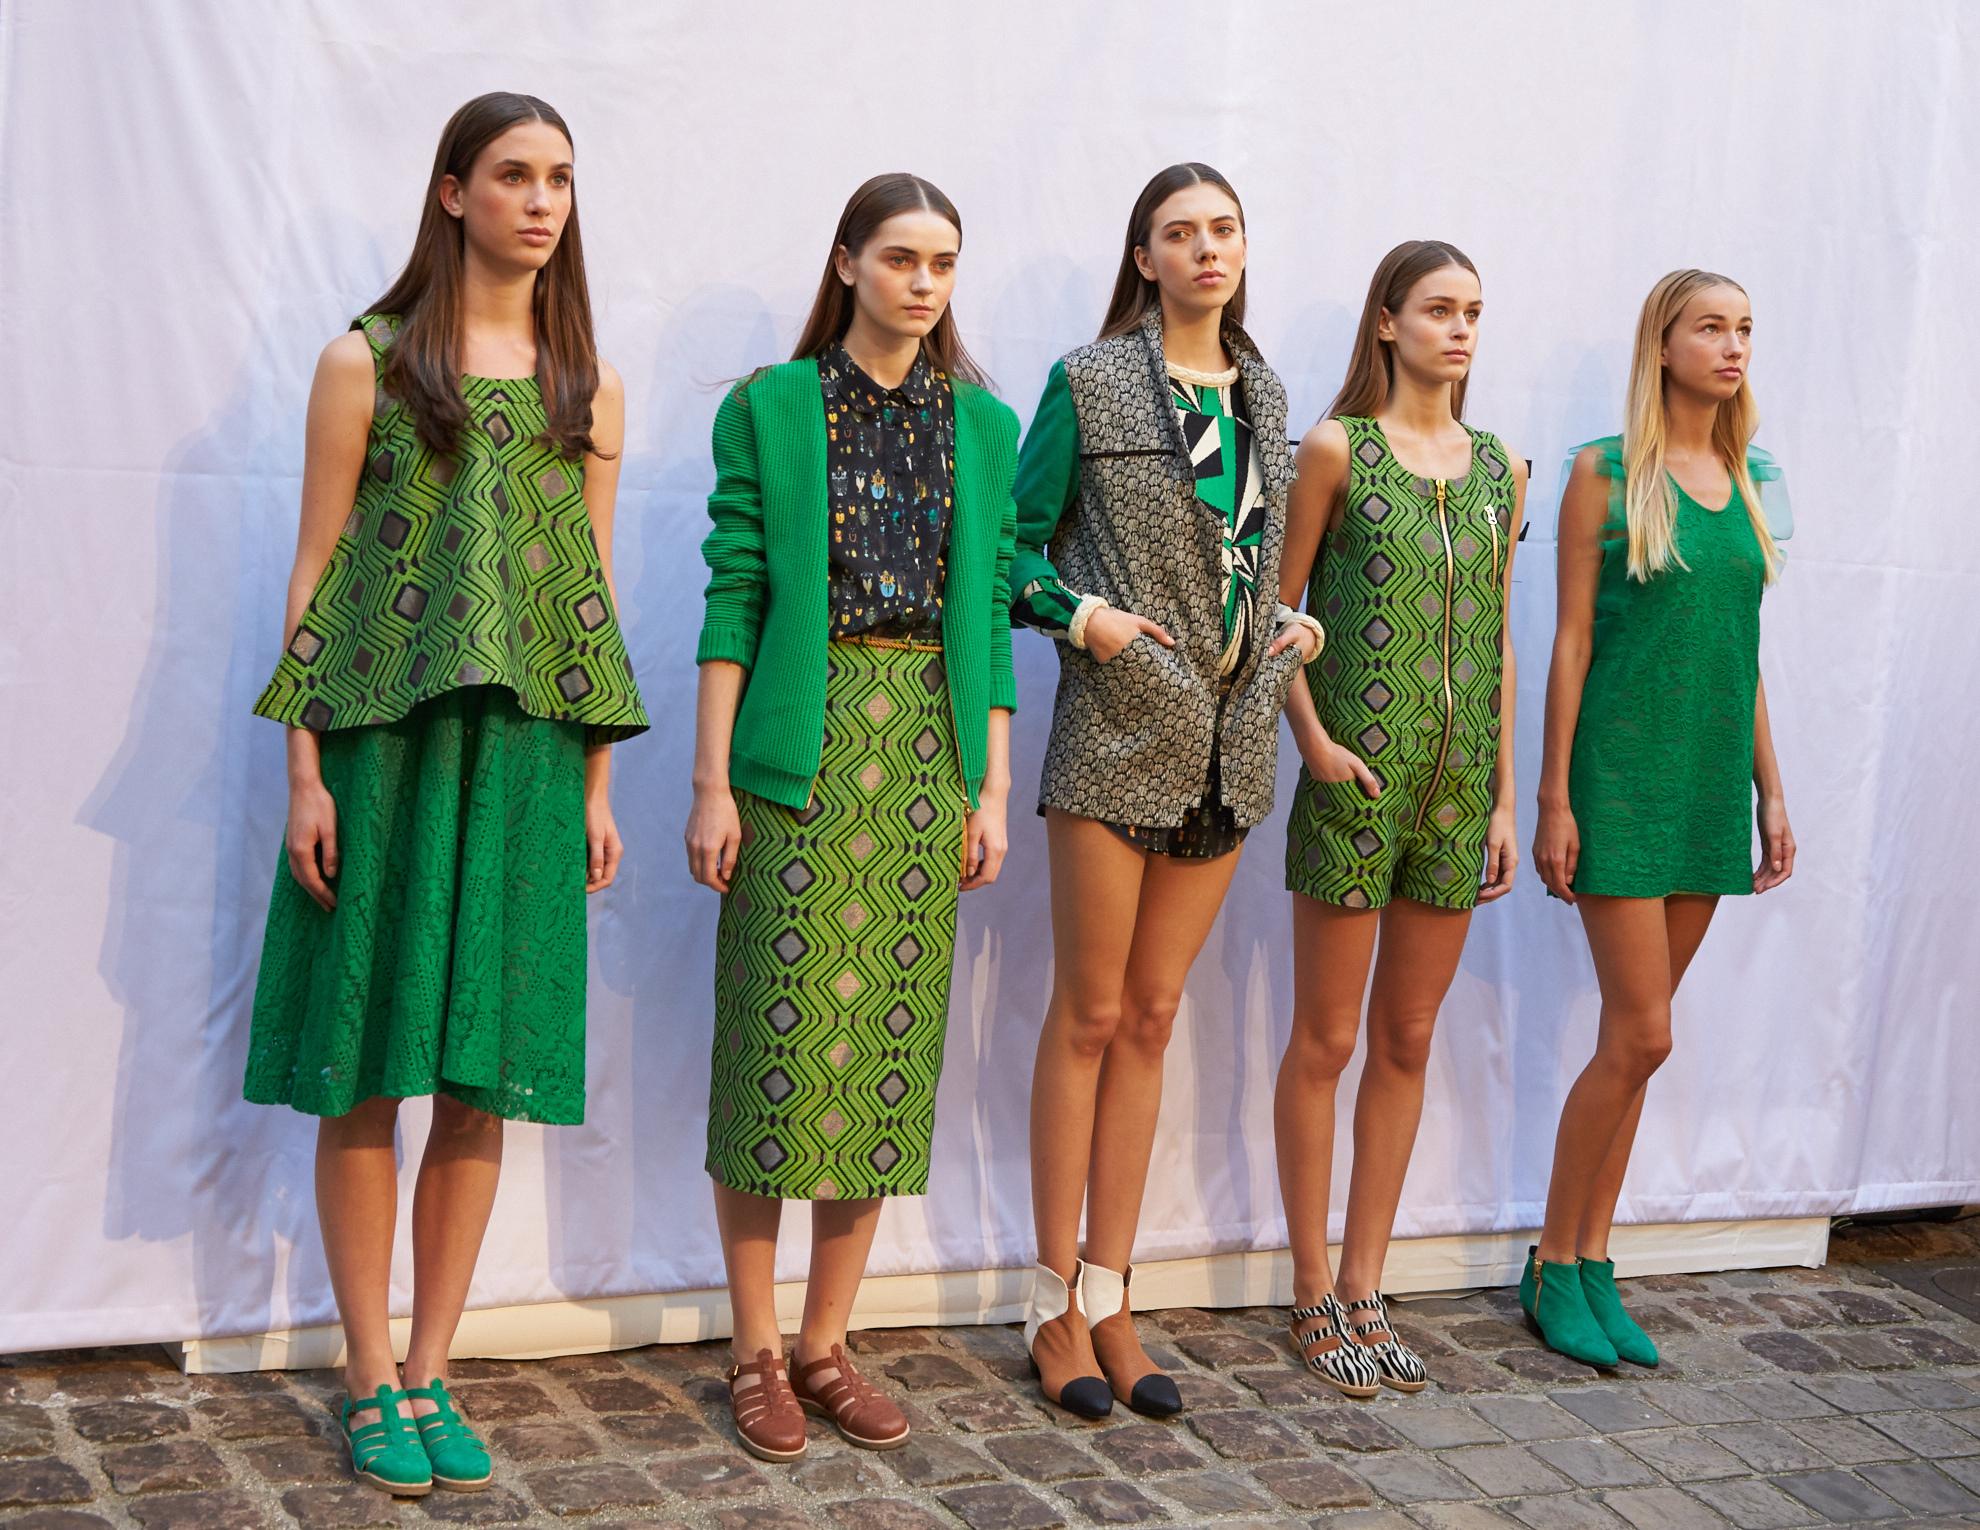 Alix Petit, Heimstone SS16 collection during Paris Fashion Week, image by ©Akin Abayomi